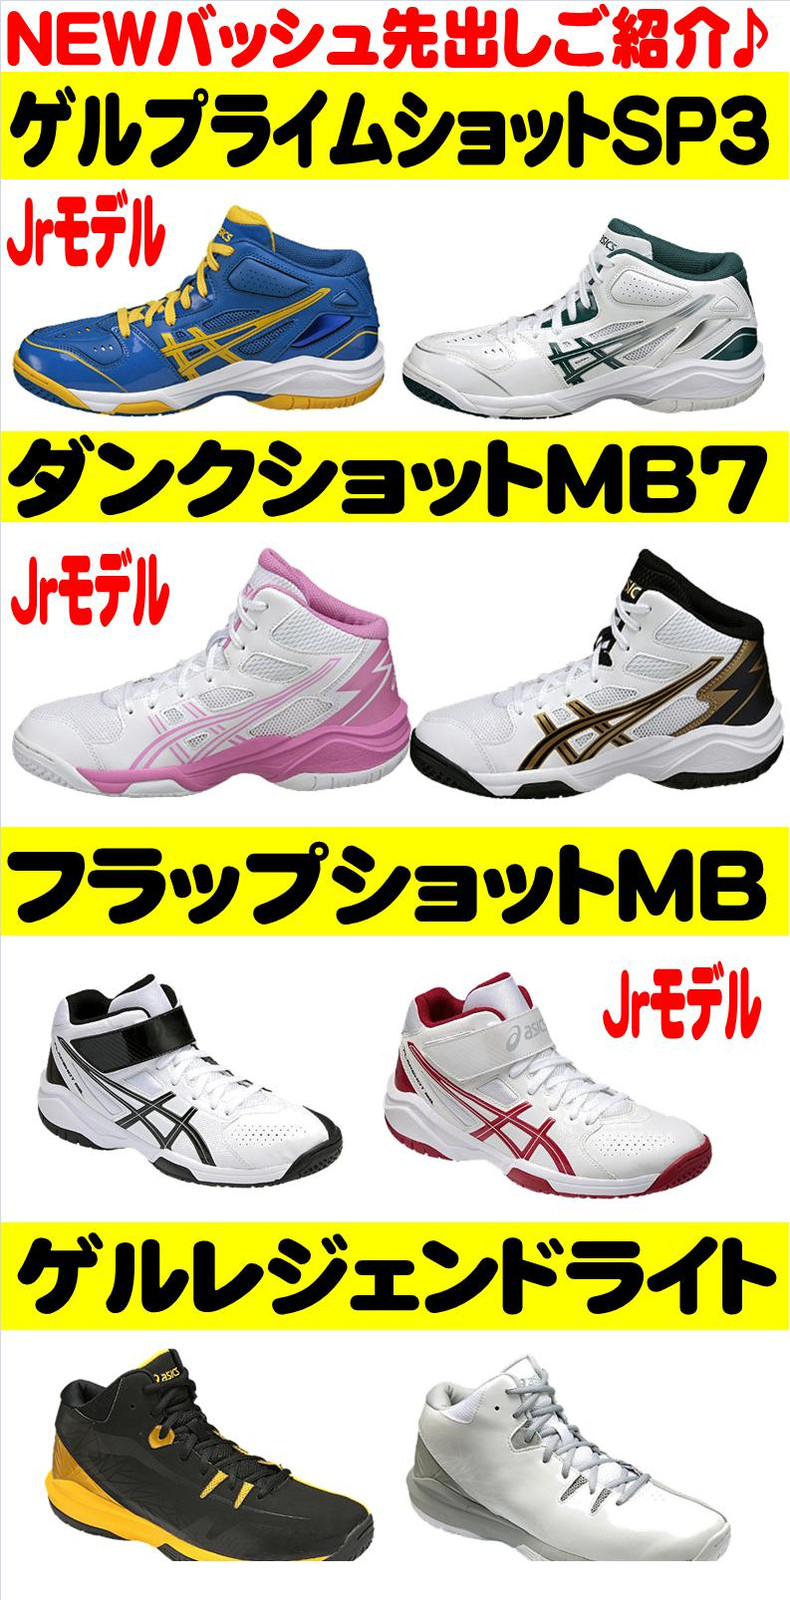 0dbc67ecd5f124 ときわスポーツ聖蹟桜ヶ丘店: 2015年2月